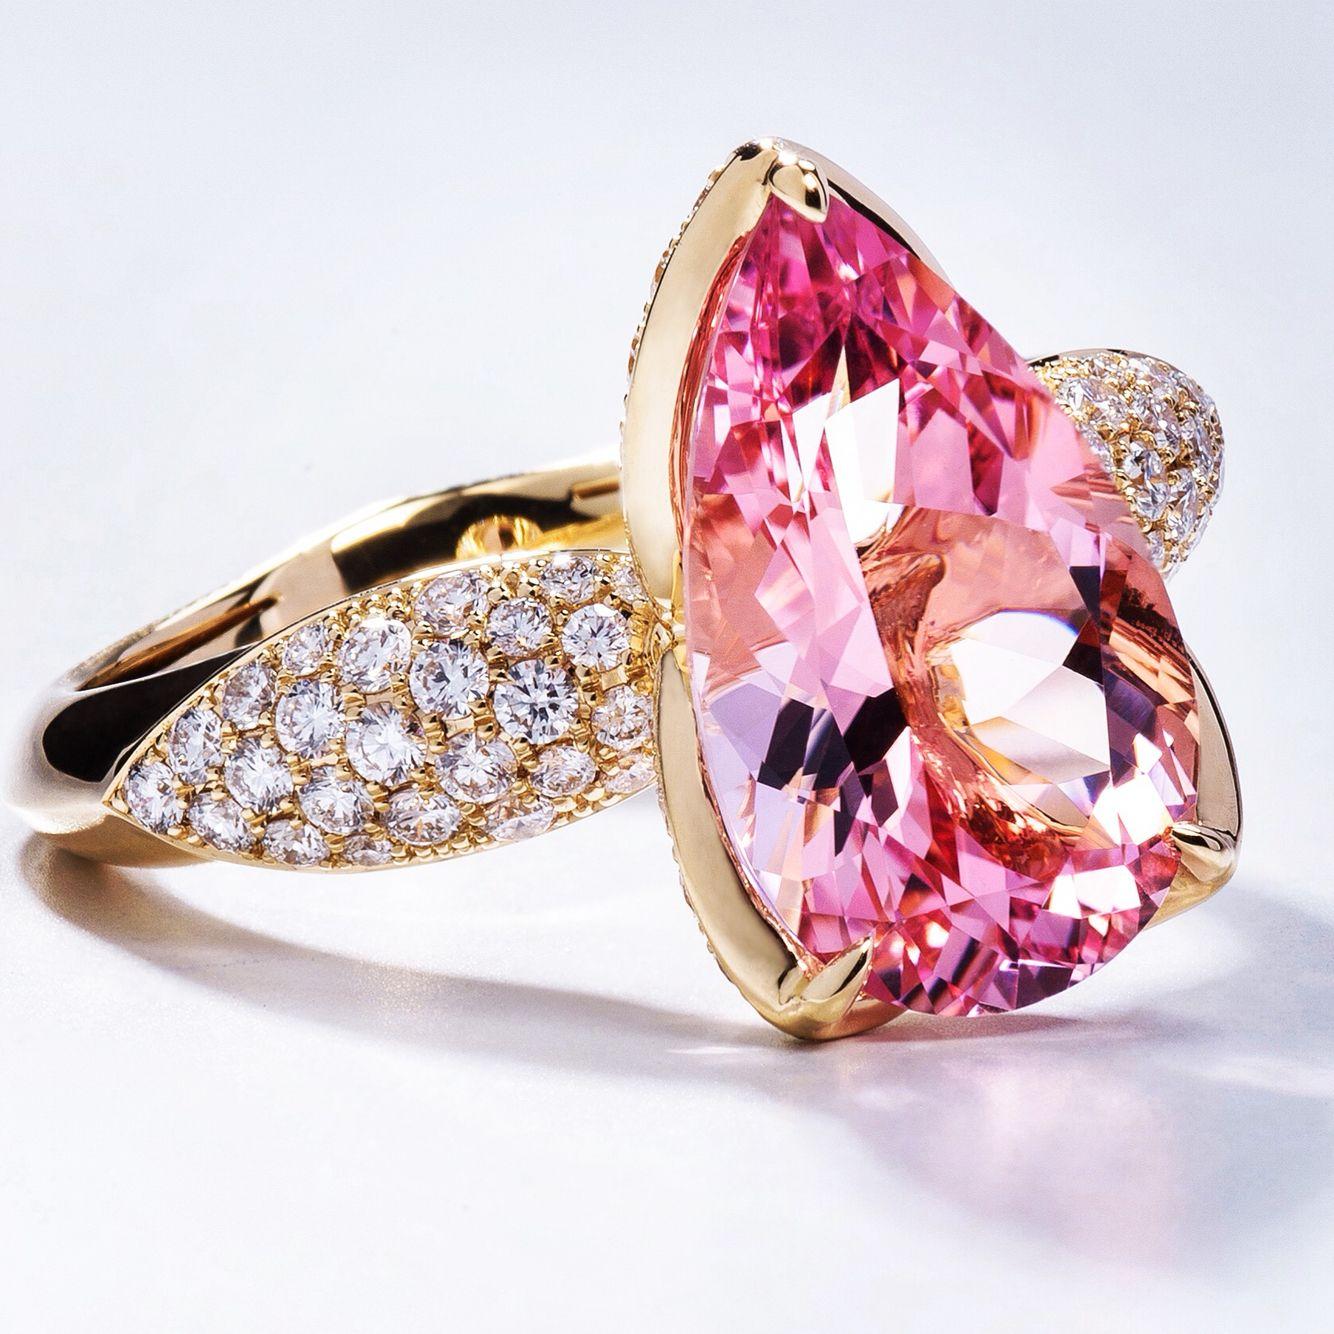 Kat Florence Pink Morganites blossom as brilliant cut D Flawless ...